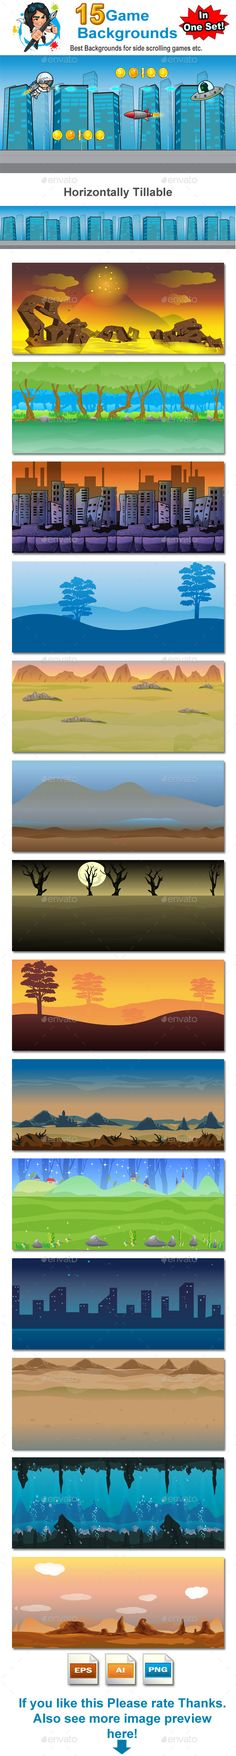 Game Backgrounds in one Set Download here: https://graphicriver.net/item/game-backgrounds-in-one-set/8790161?ref=KlitVogli